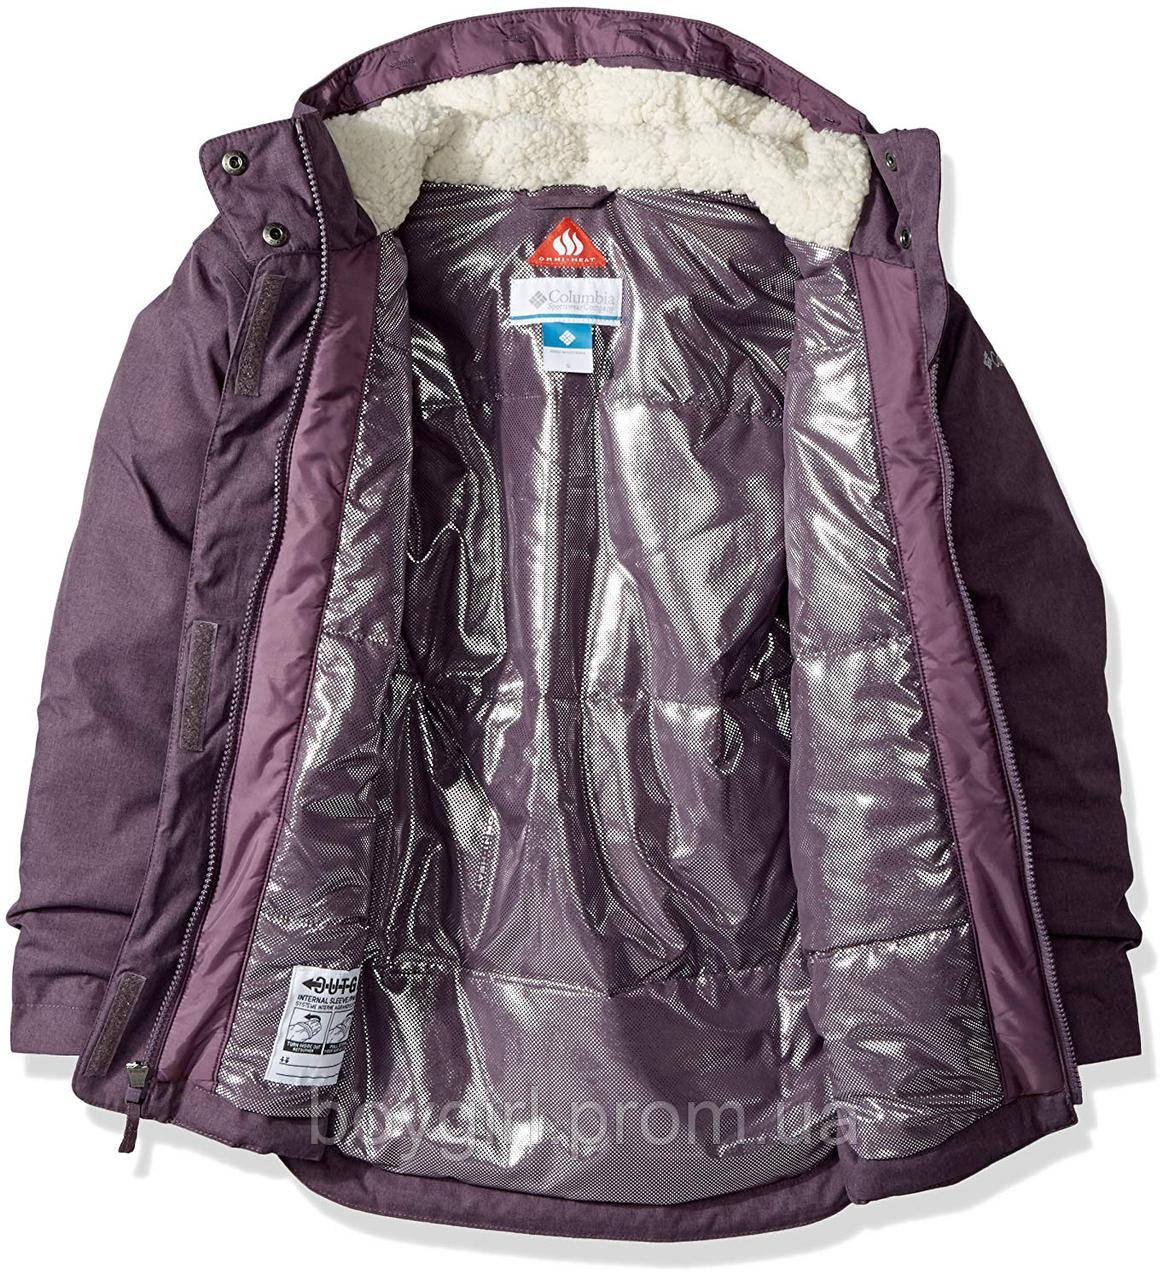 Куртка Columbia Omni-Heat зимняя удлинённая с системой роста ... e4f8cc77fa51d